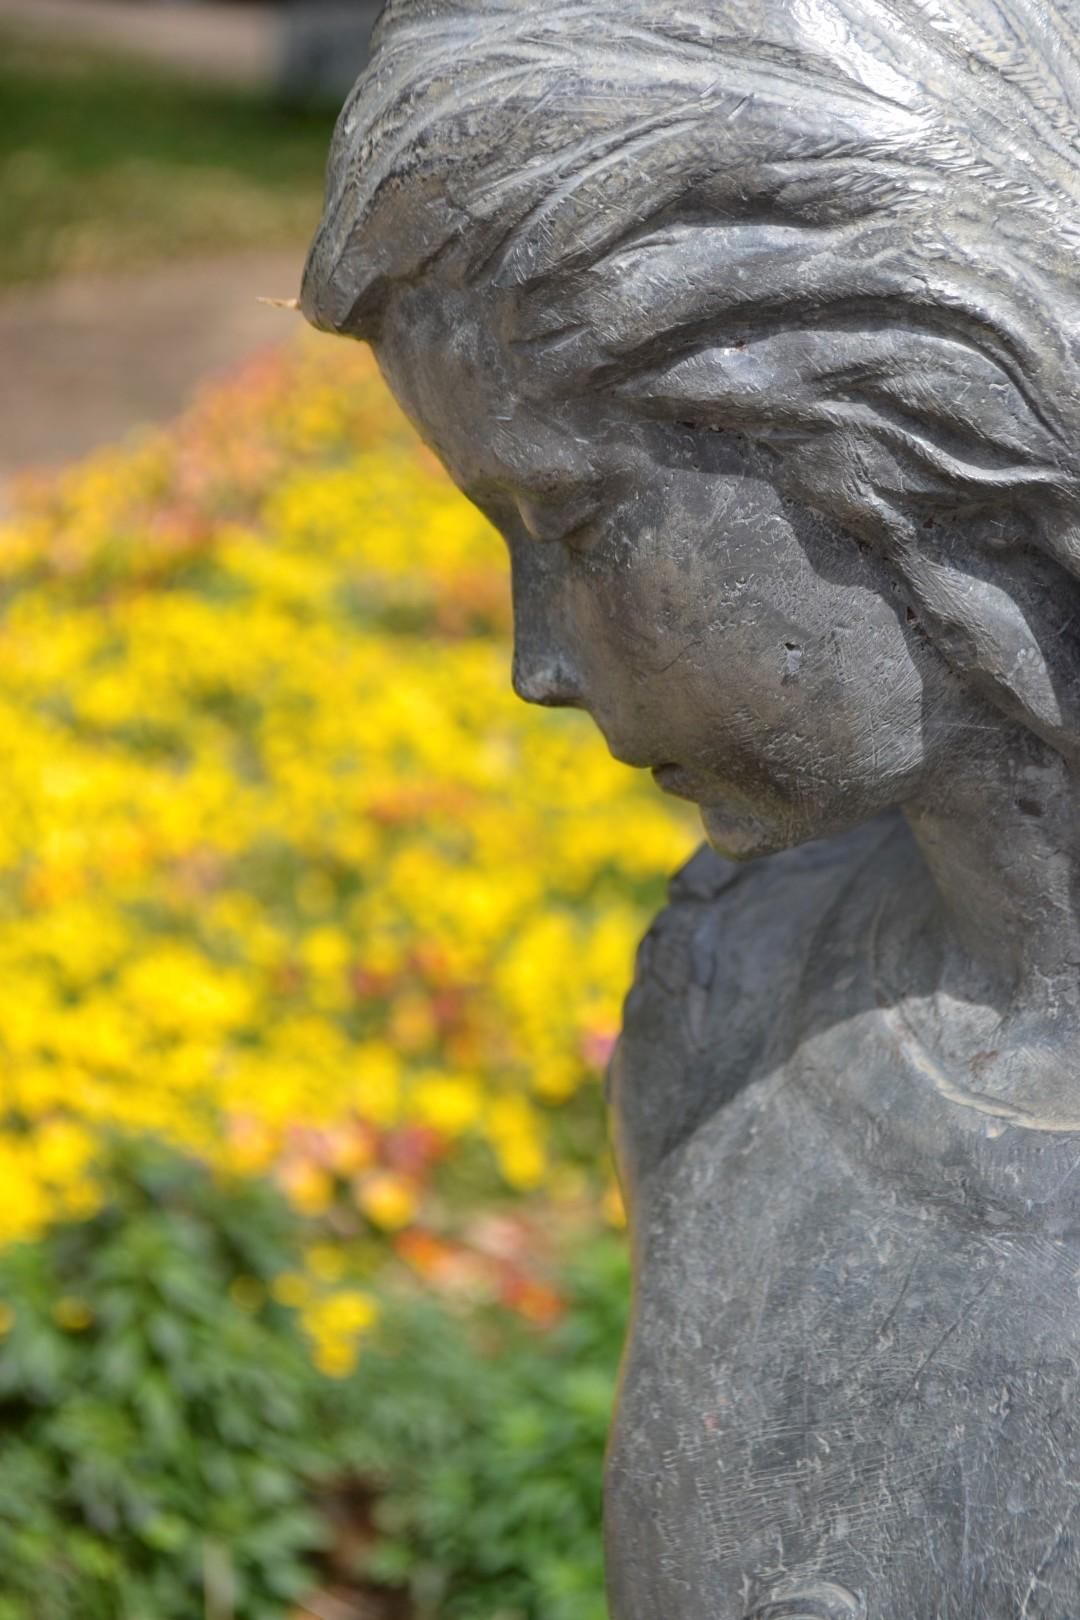 Forth Worth Botanical Garden, photo: Andy Bruner